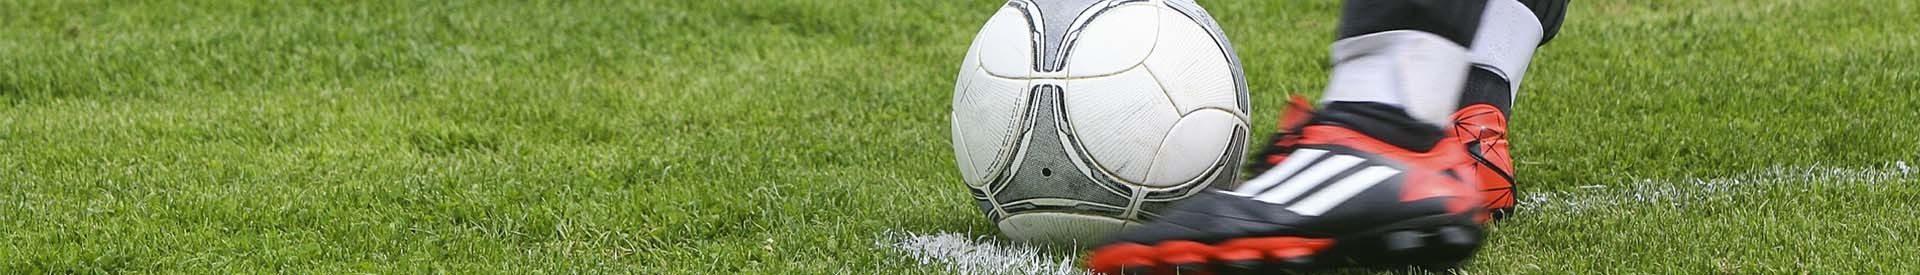 sport-foot-ball-stages-fcna-bubble-foot-nantes-loire-atlantique-280